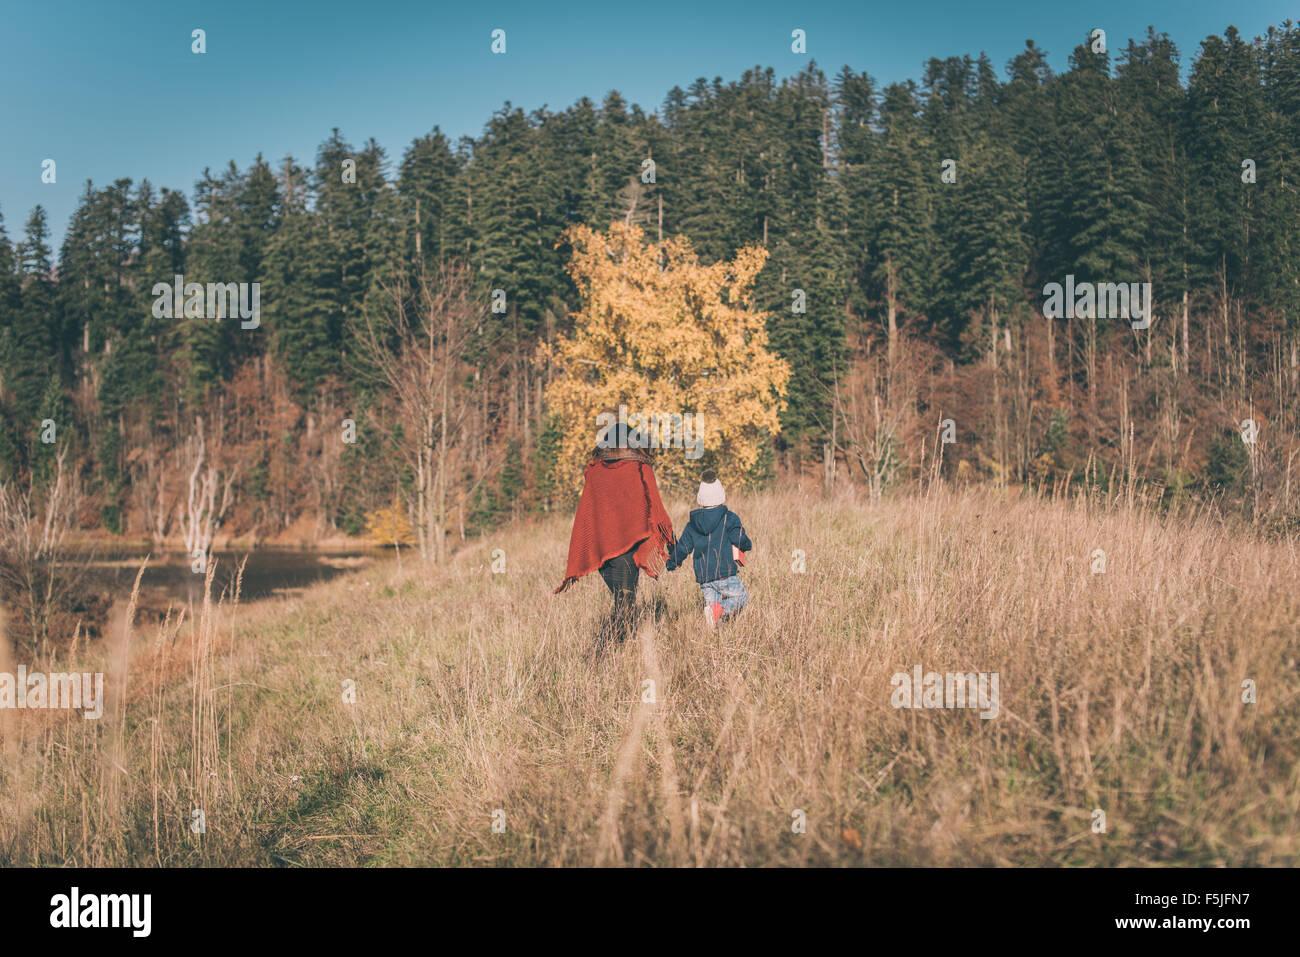 Madre e hijo de caminar en la naturaleza Imagen De Stock